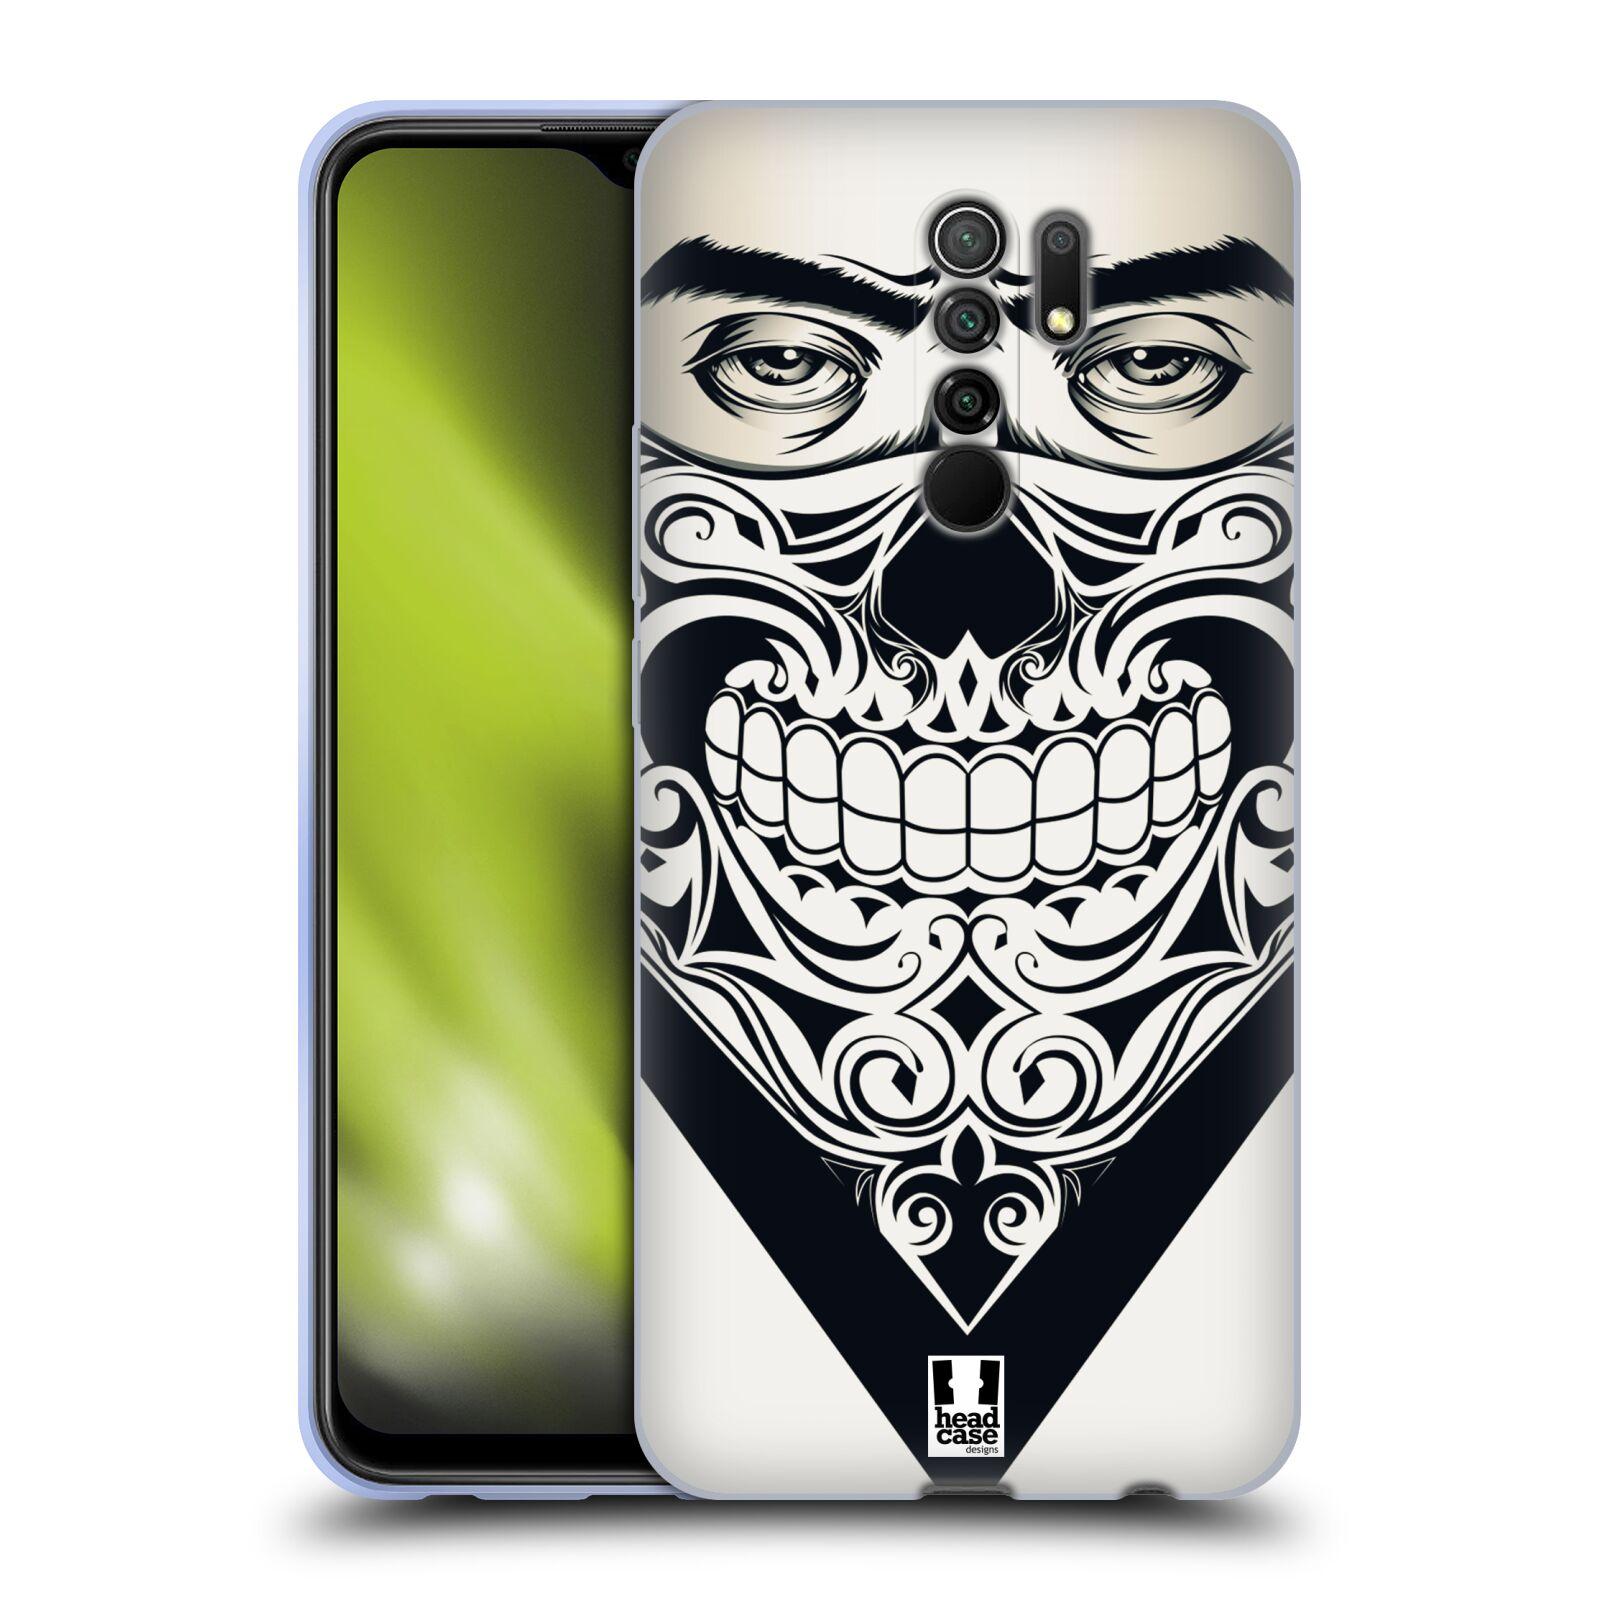 Silikonové pouzdro na mobil Xiaomi Redmi 9 - Head Case - LEBKA BANDANA